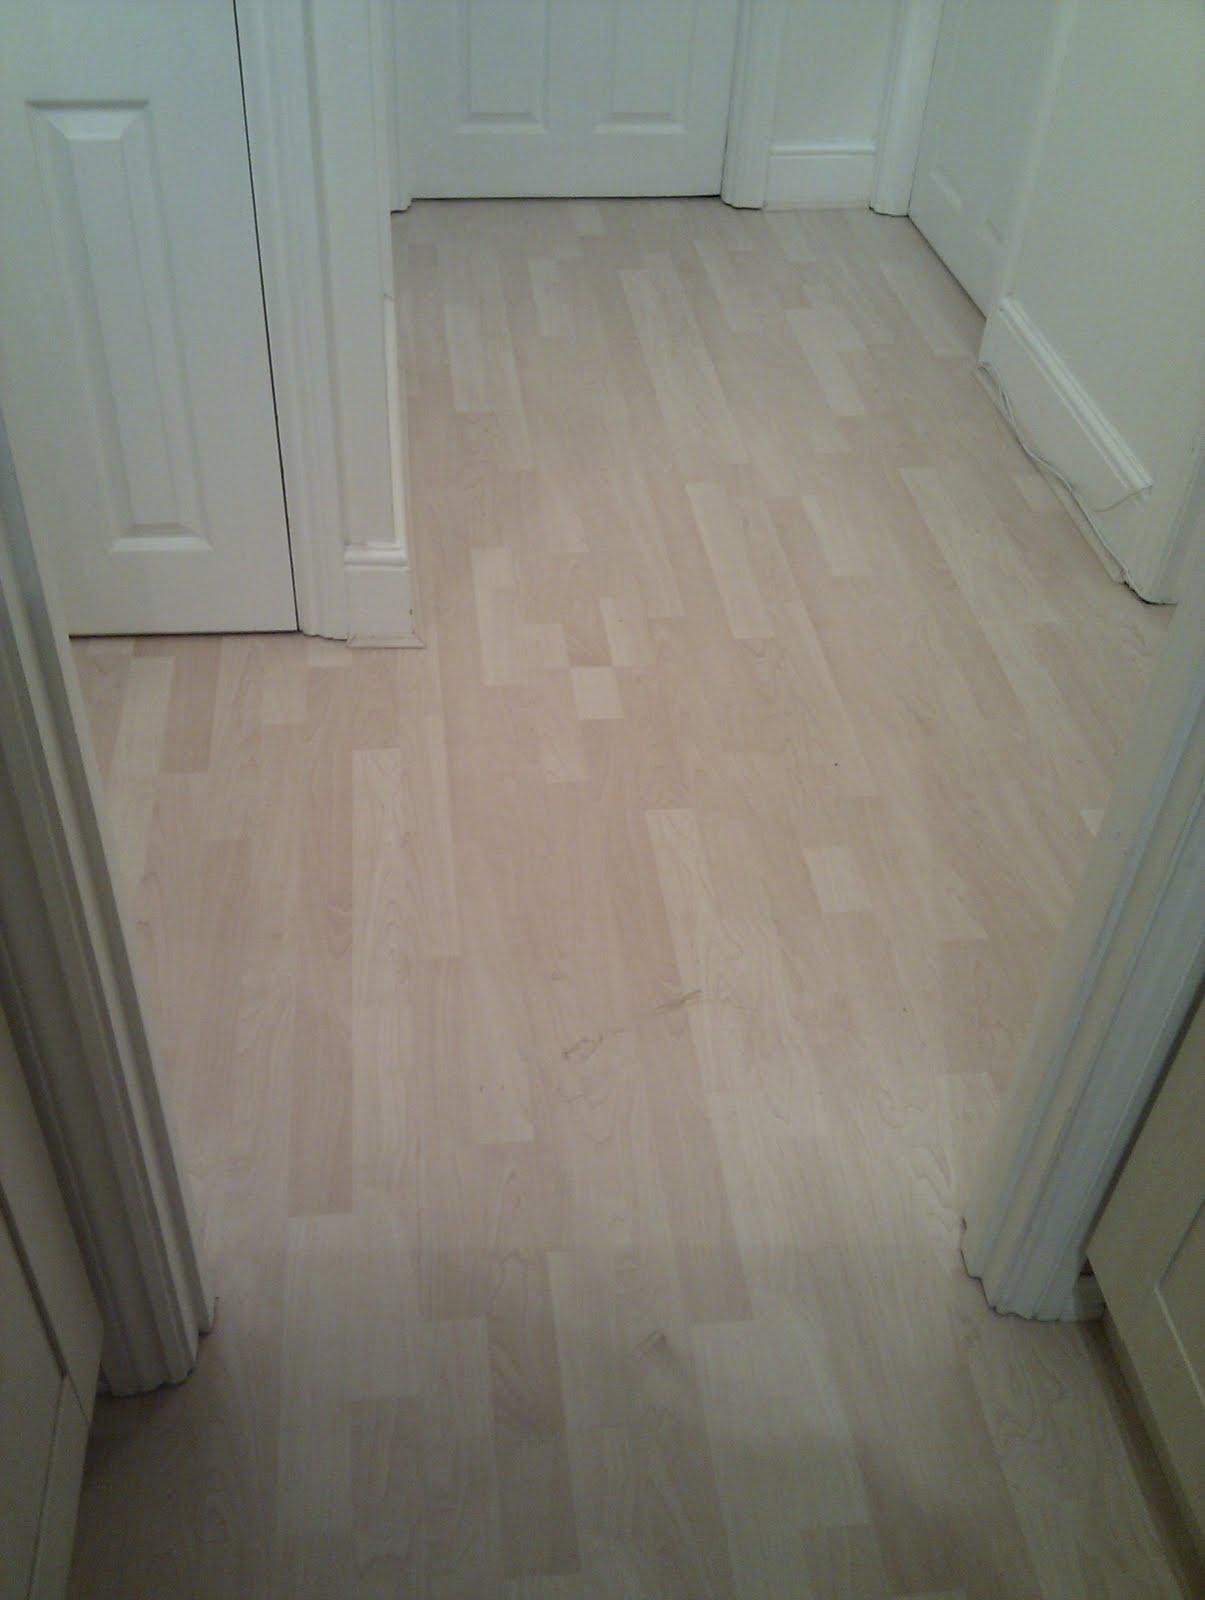 Tom Flooring Ealing Laminate Wood Flooring Kitchen Hollway Bathroom